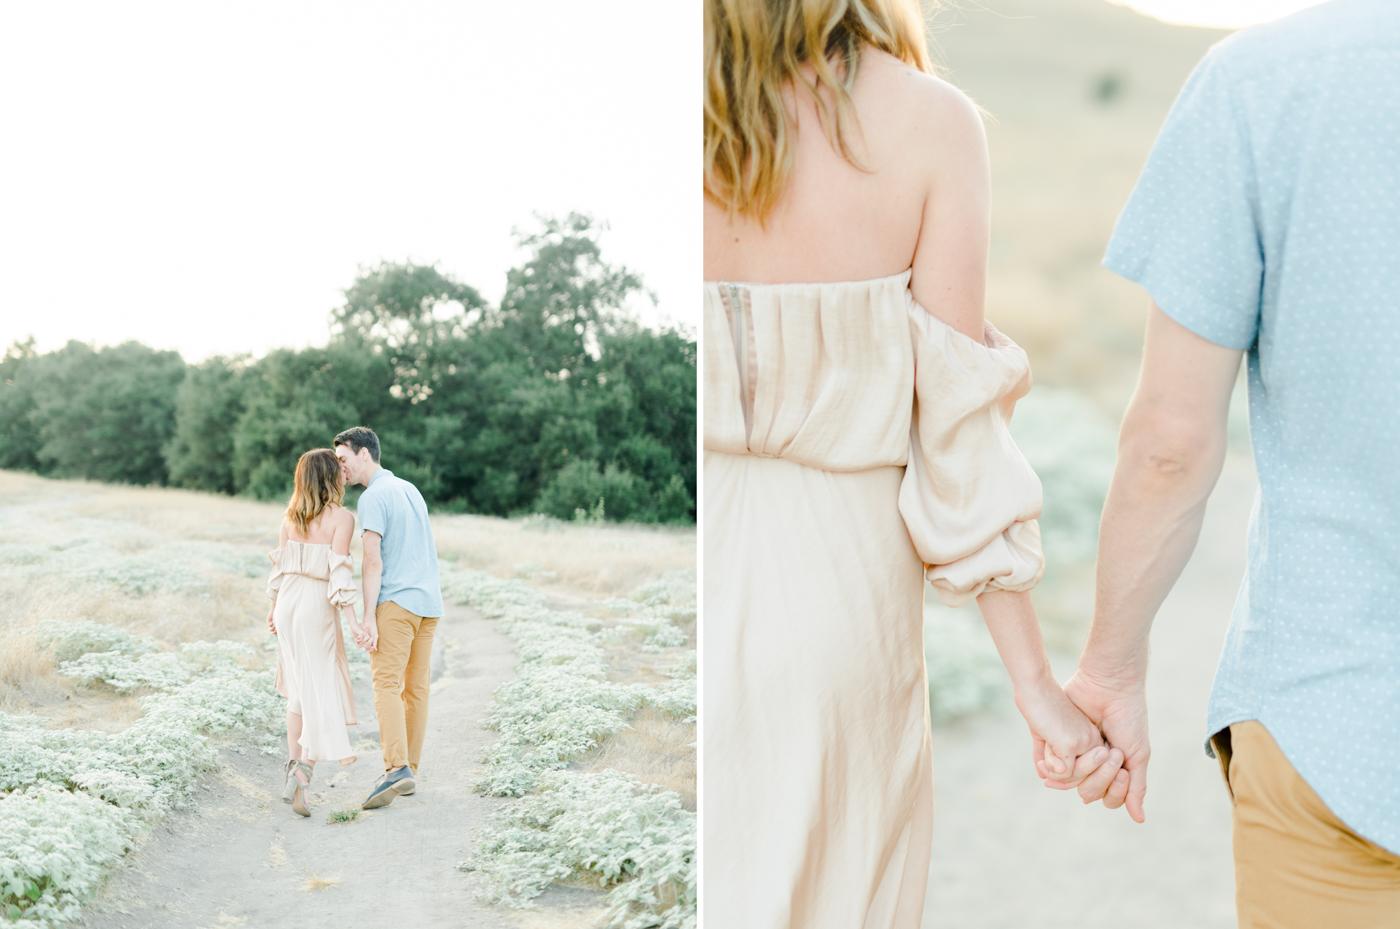 Malibu_Creek_State_Park_Romantic_Engagement_Session_C&J_romantic-13.jpg